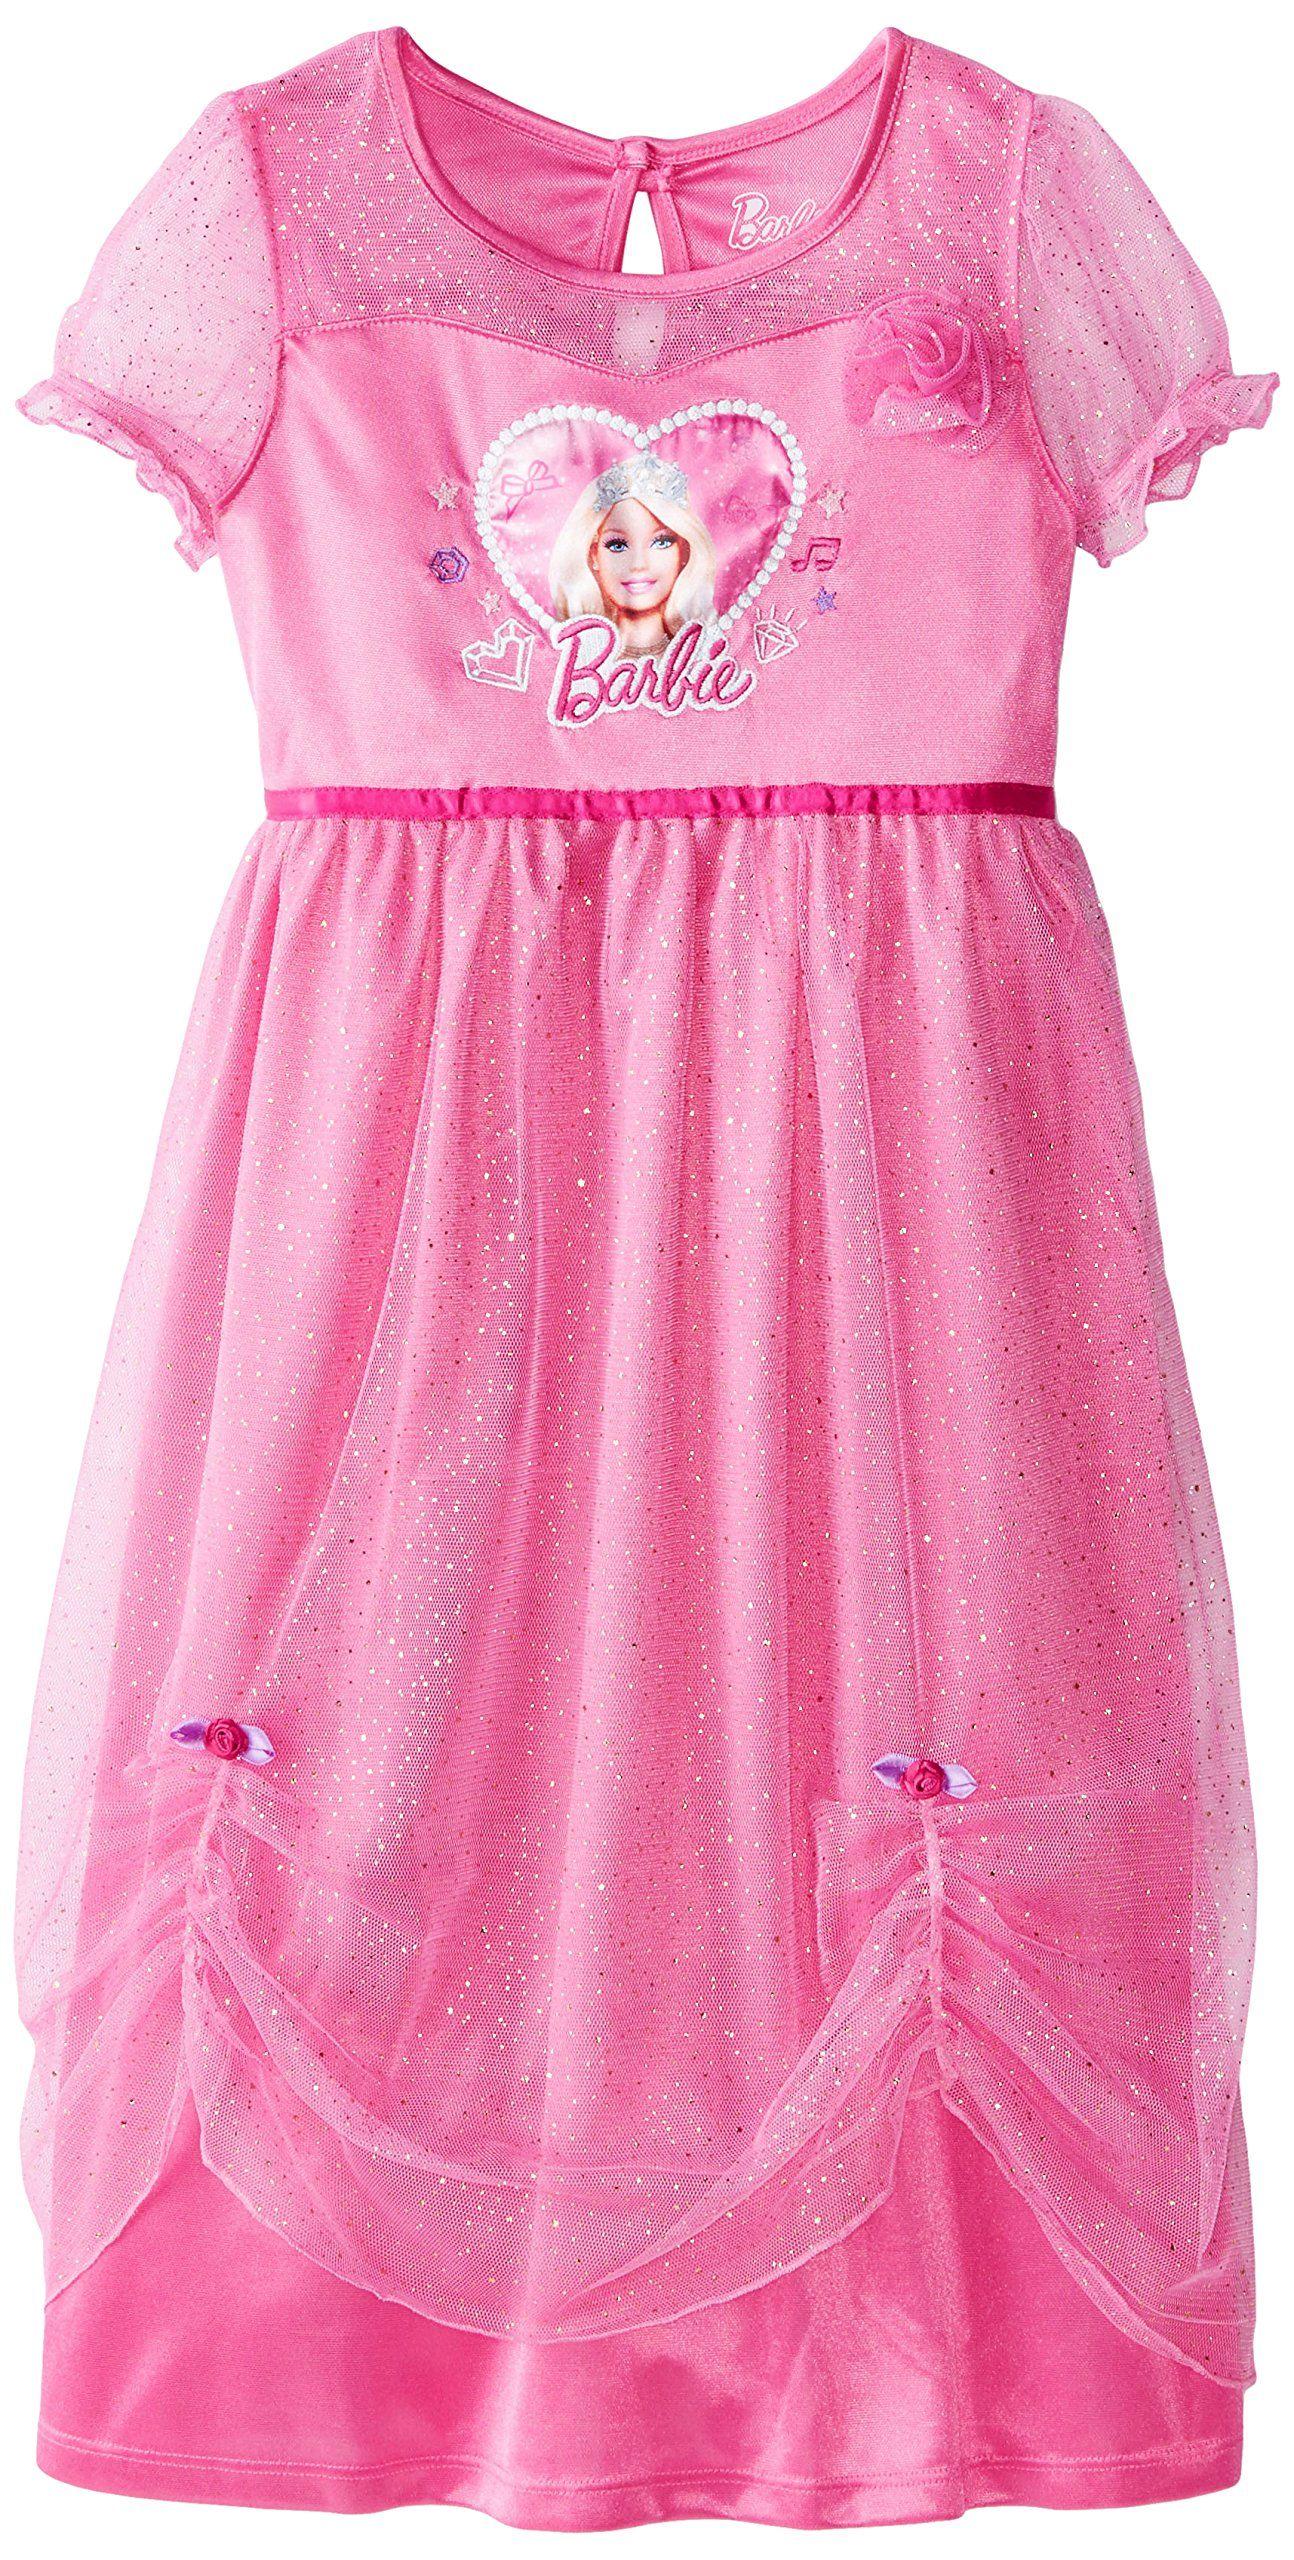 bde720d511 Barbie Big Girls  Dressy Gown